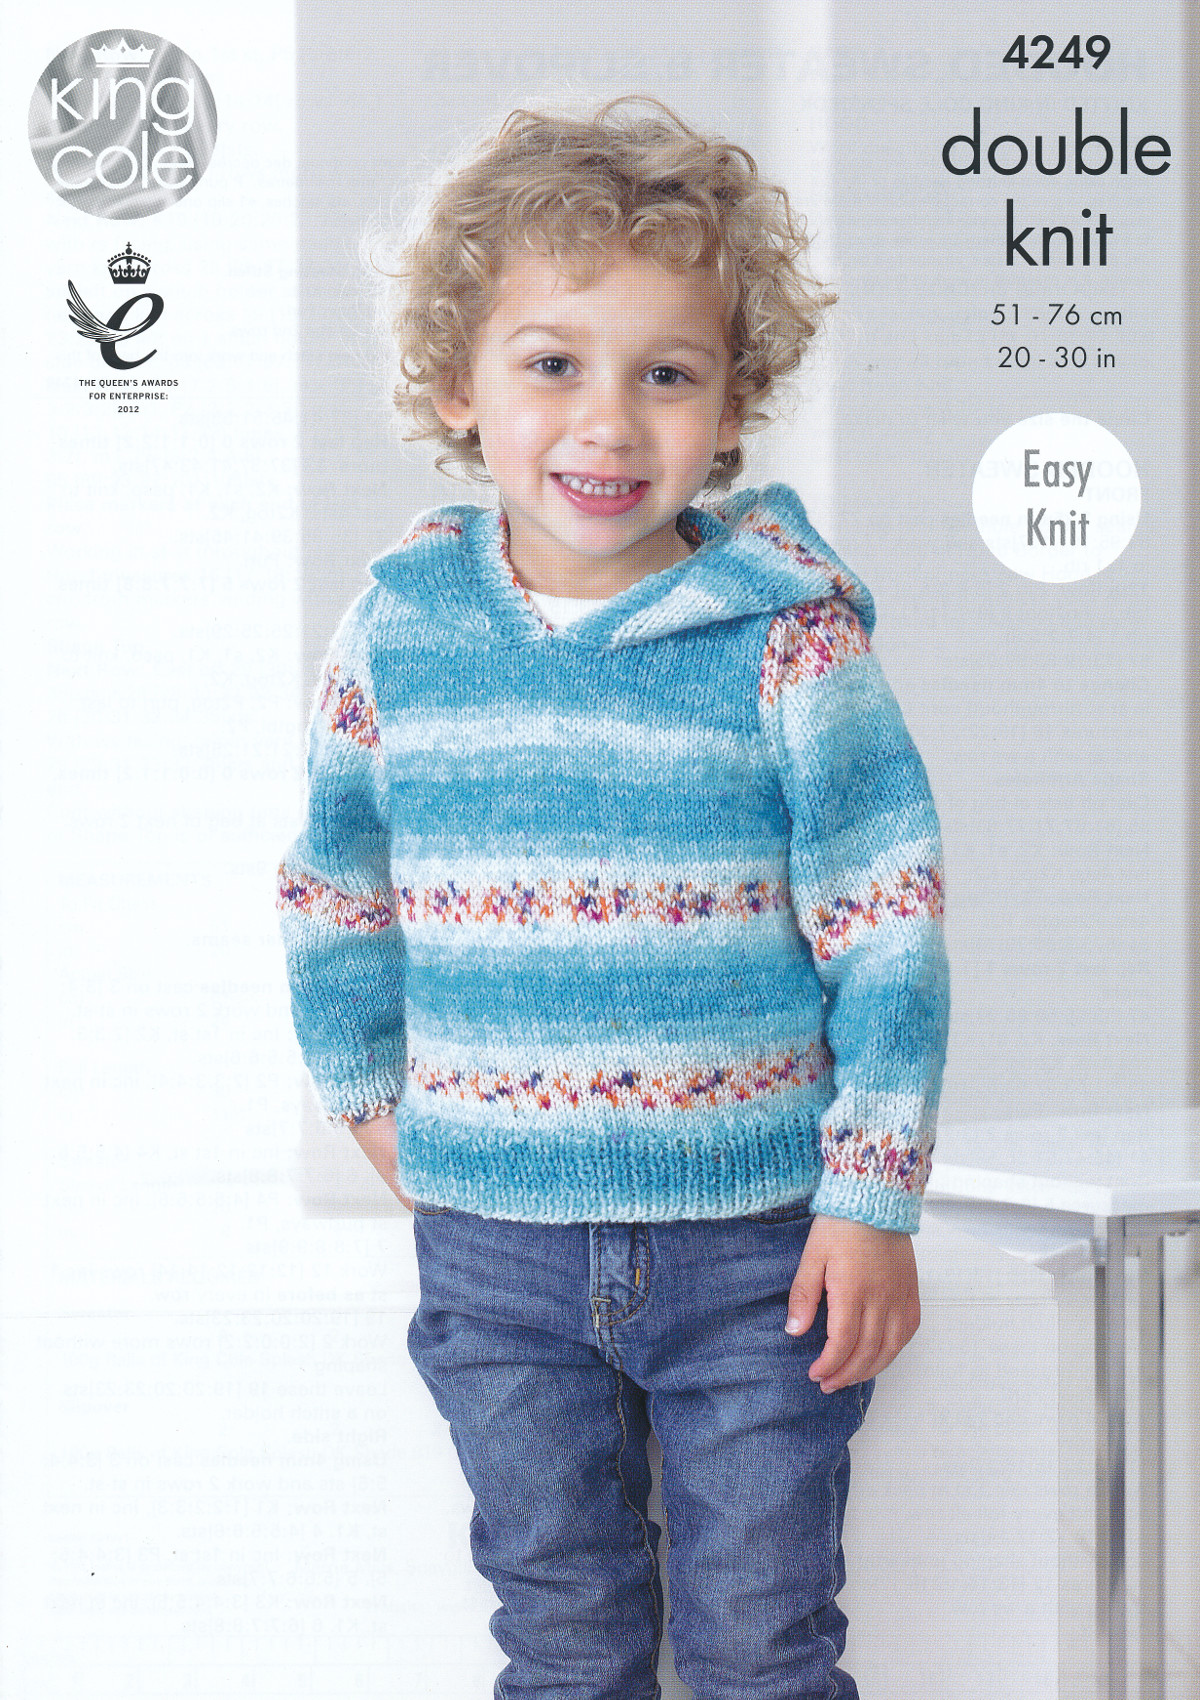 Kids Double Knitting Pattern King Cole Hooded Jumper Pullover Splash ...